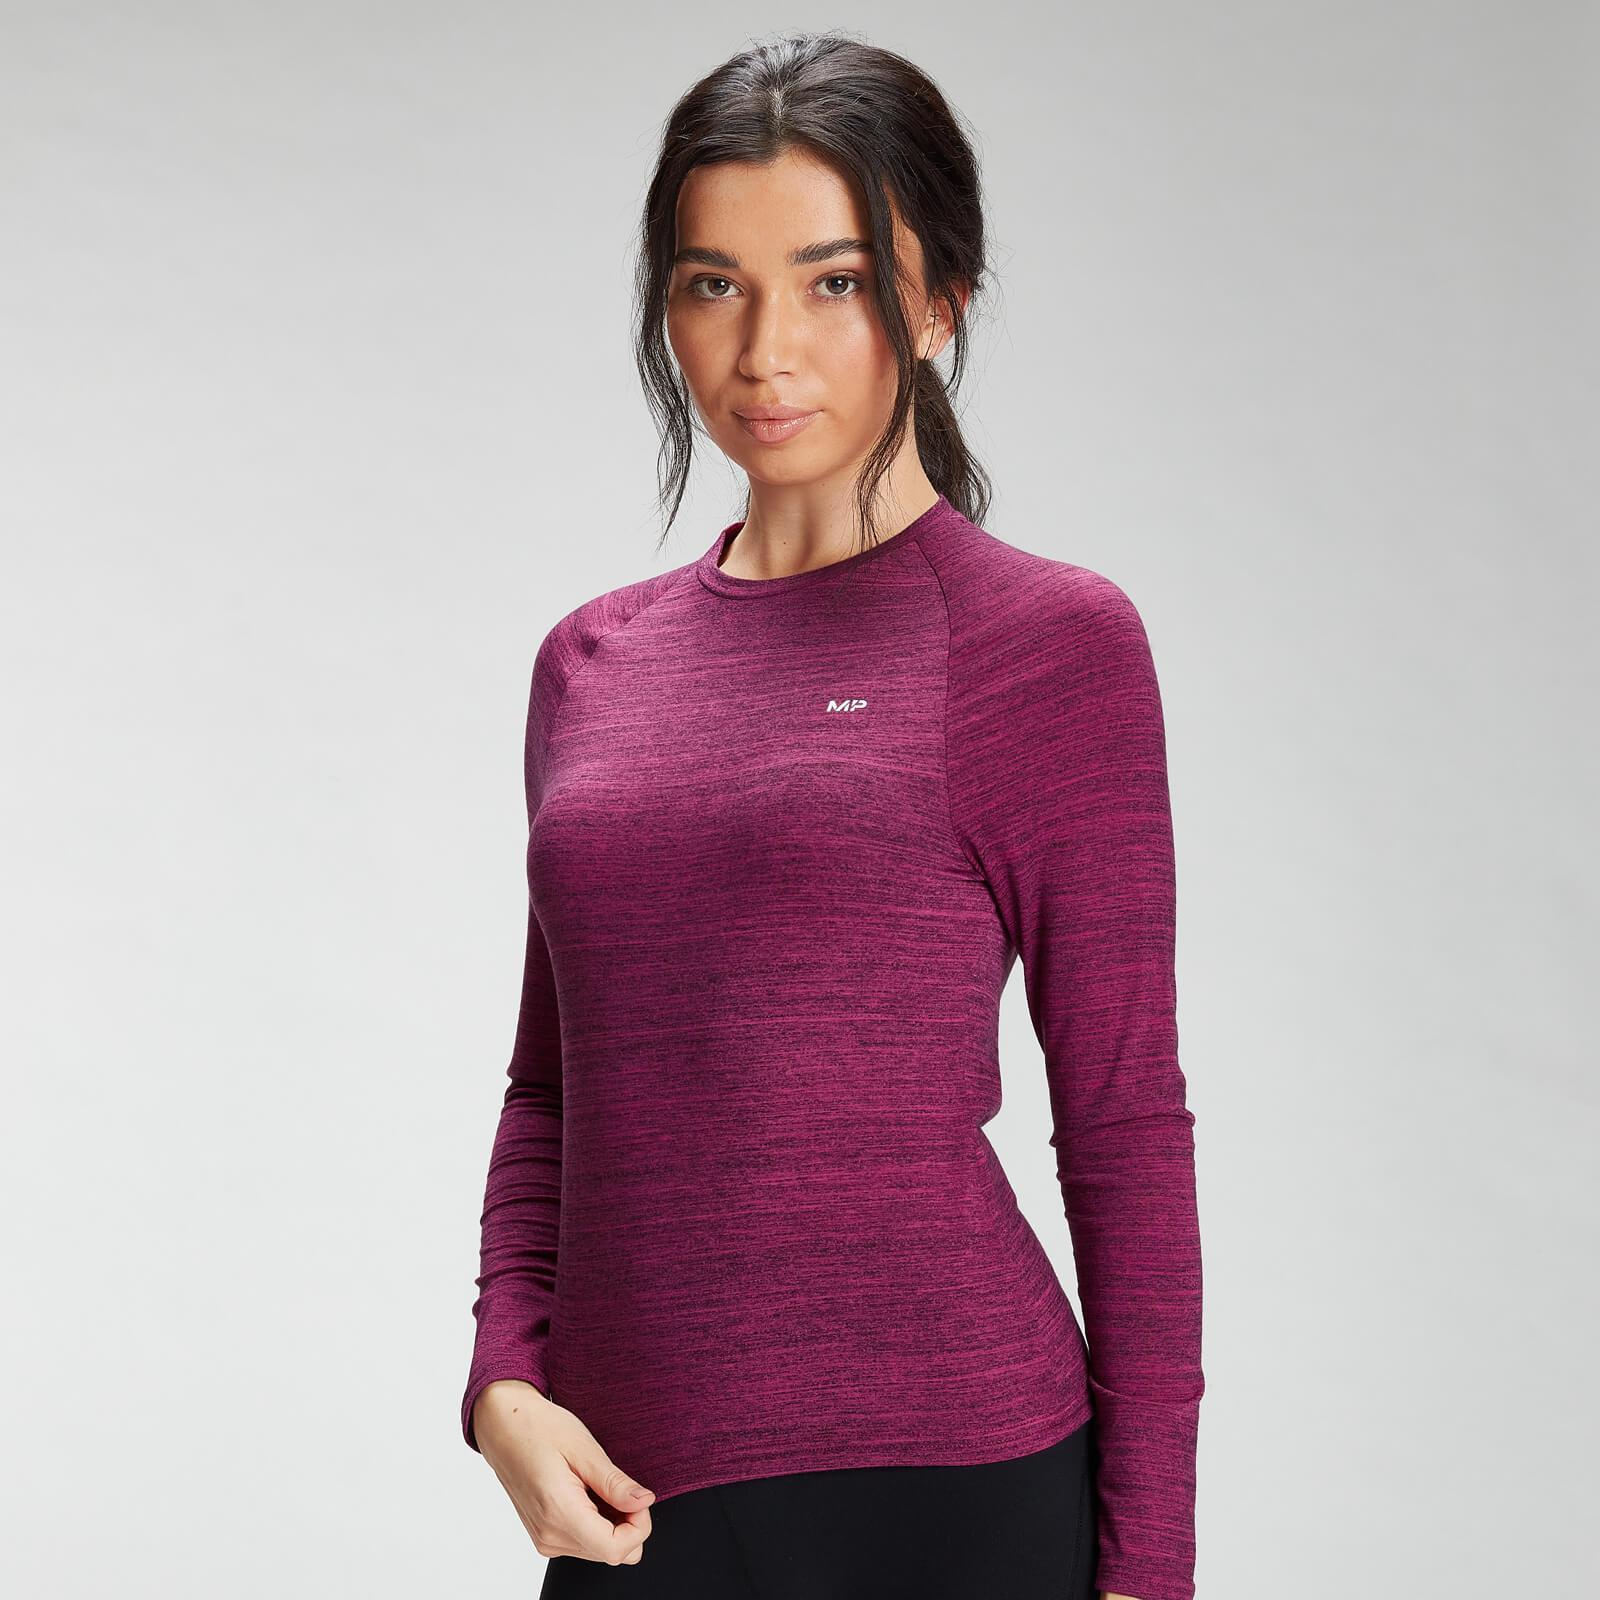 MP Women's Performance Long Sleeve Training T-Shirt - Deep Pink Marl with Black Fleck - XL, Myprotein International  - купить со скидкой